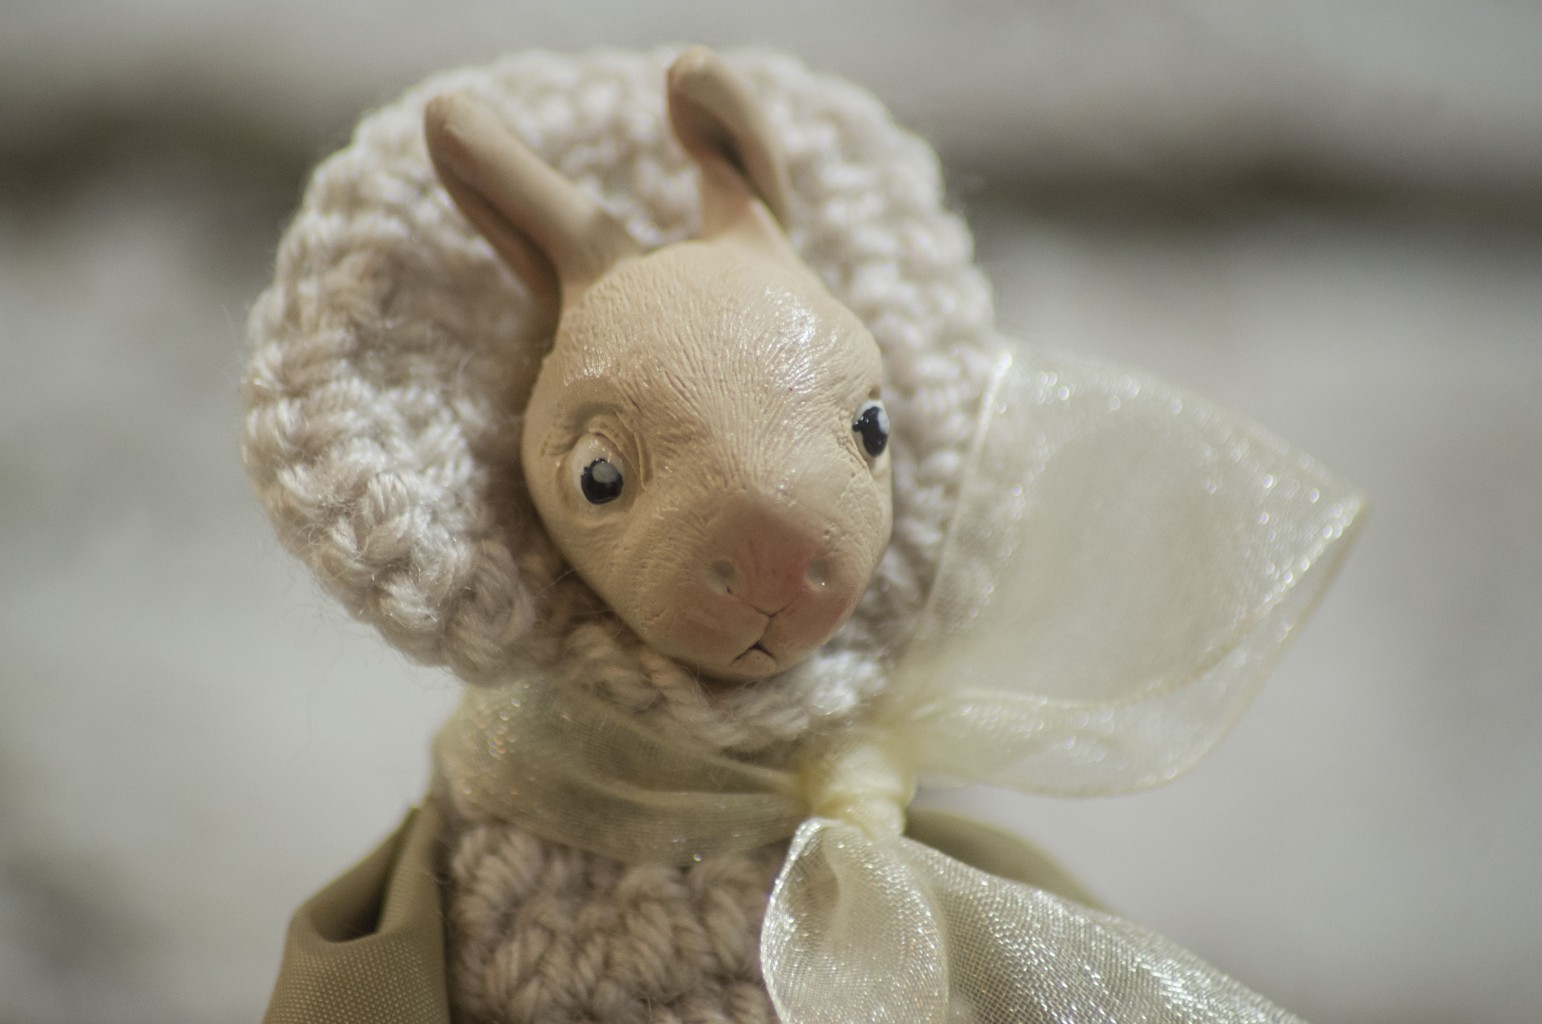 Handmade dolls by Anna Markova